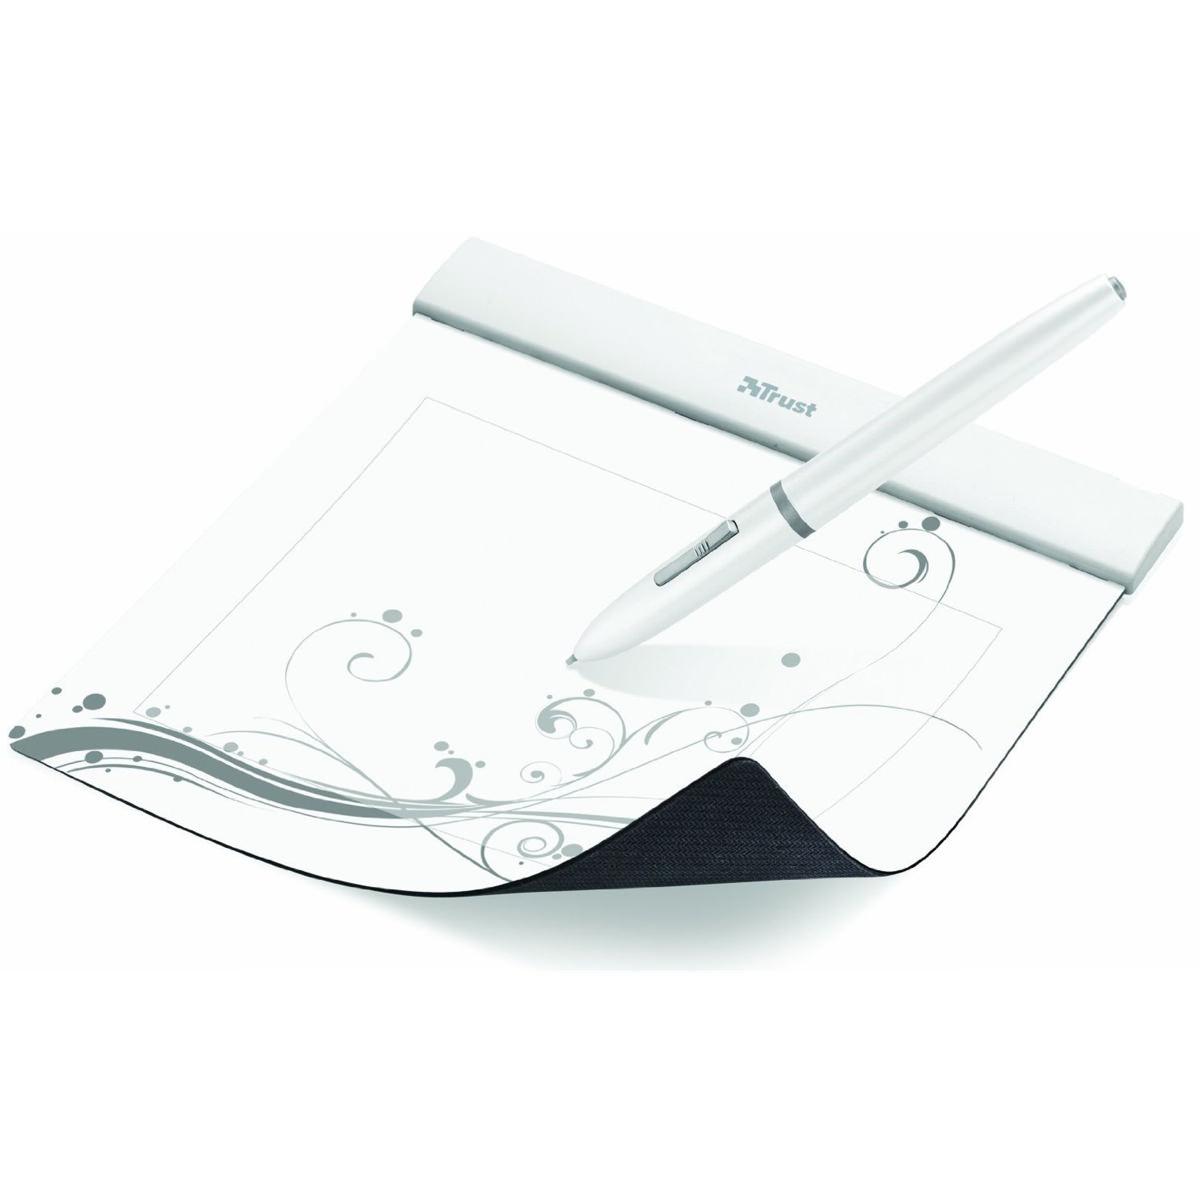 Trust Flex Design Tablet, tavoletta grafica flessibile e leggera: 29 euro